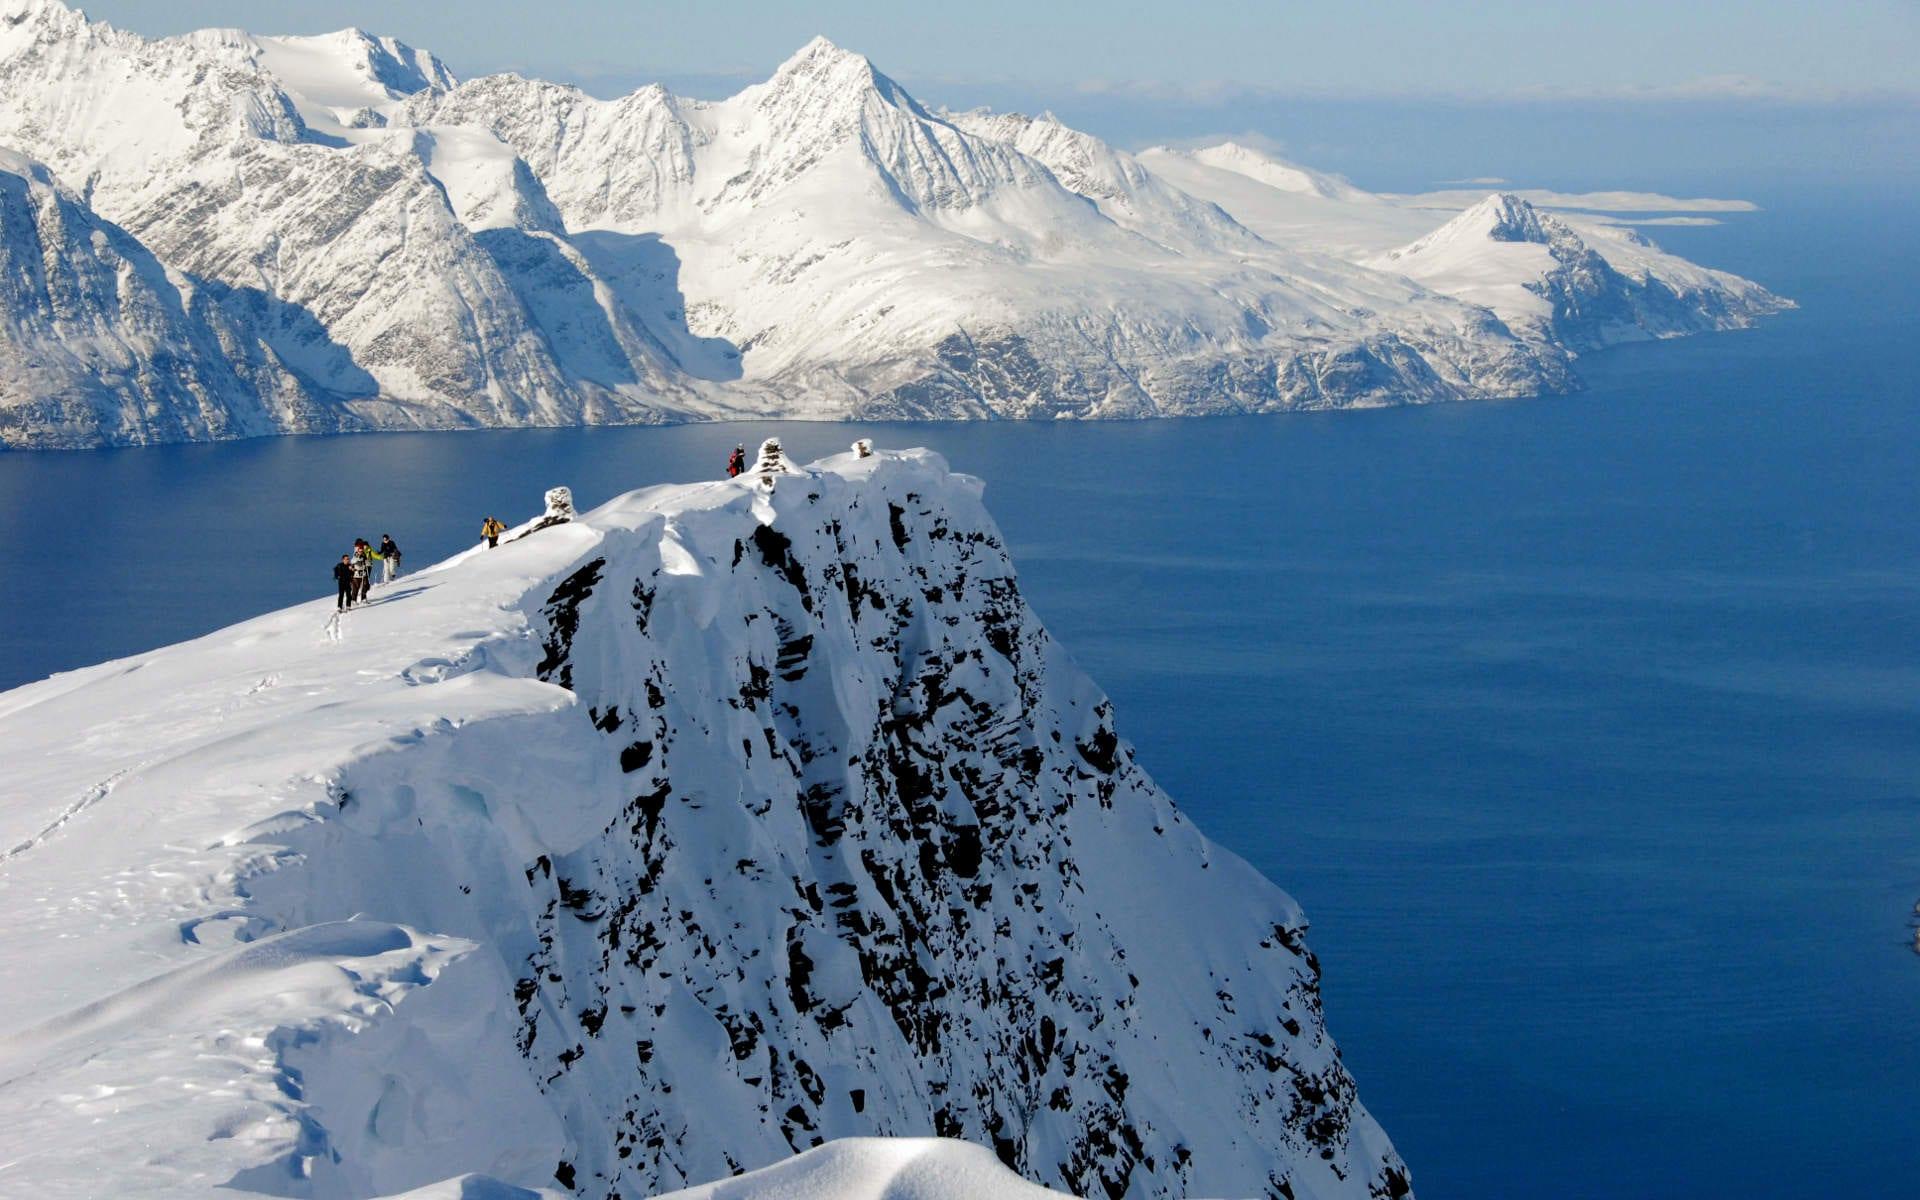 ski touring nordreisa norway landscape